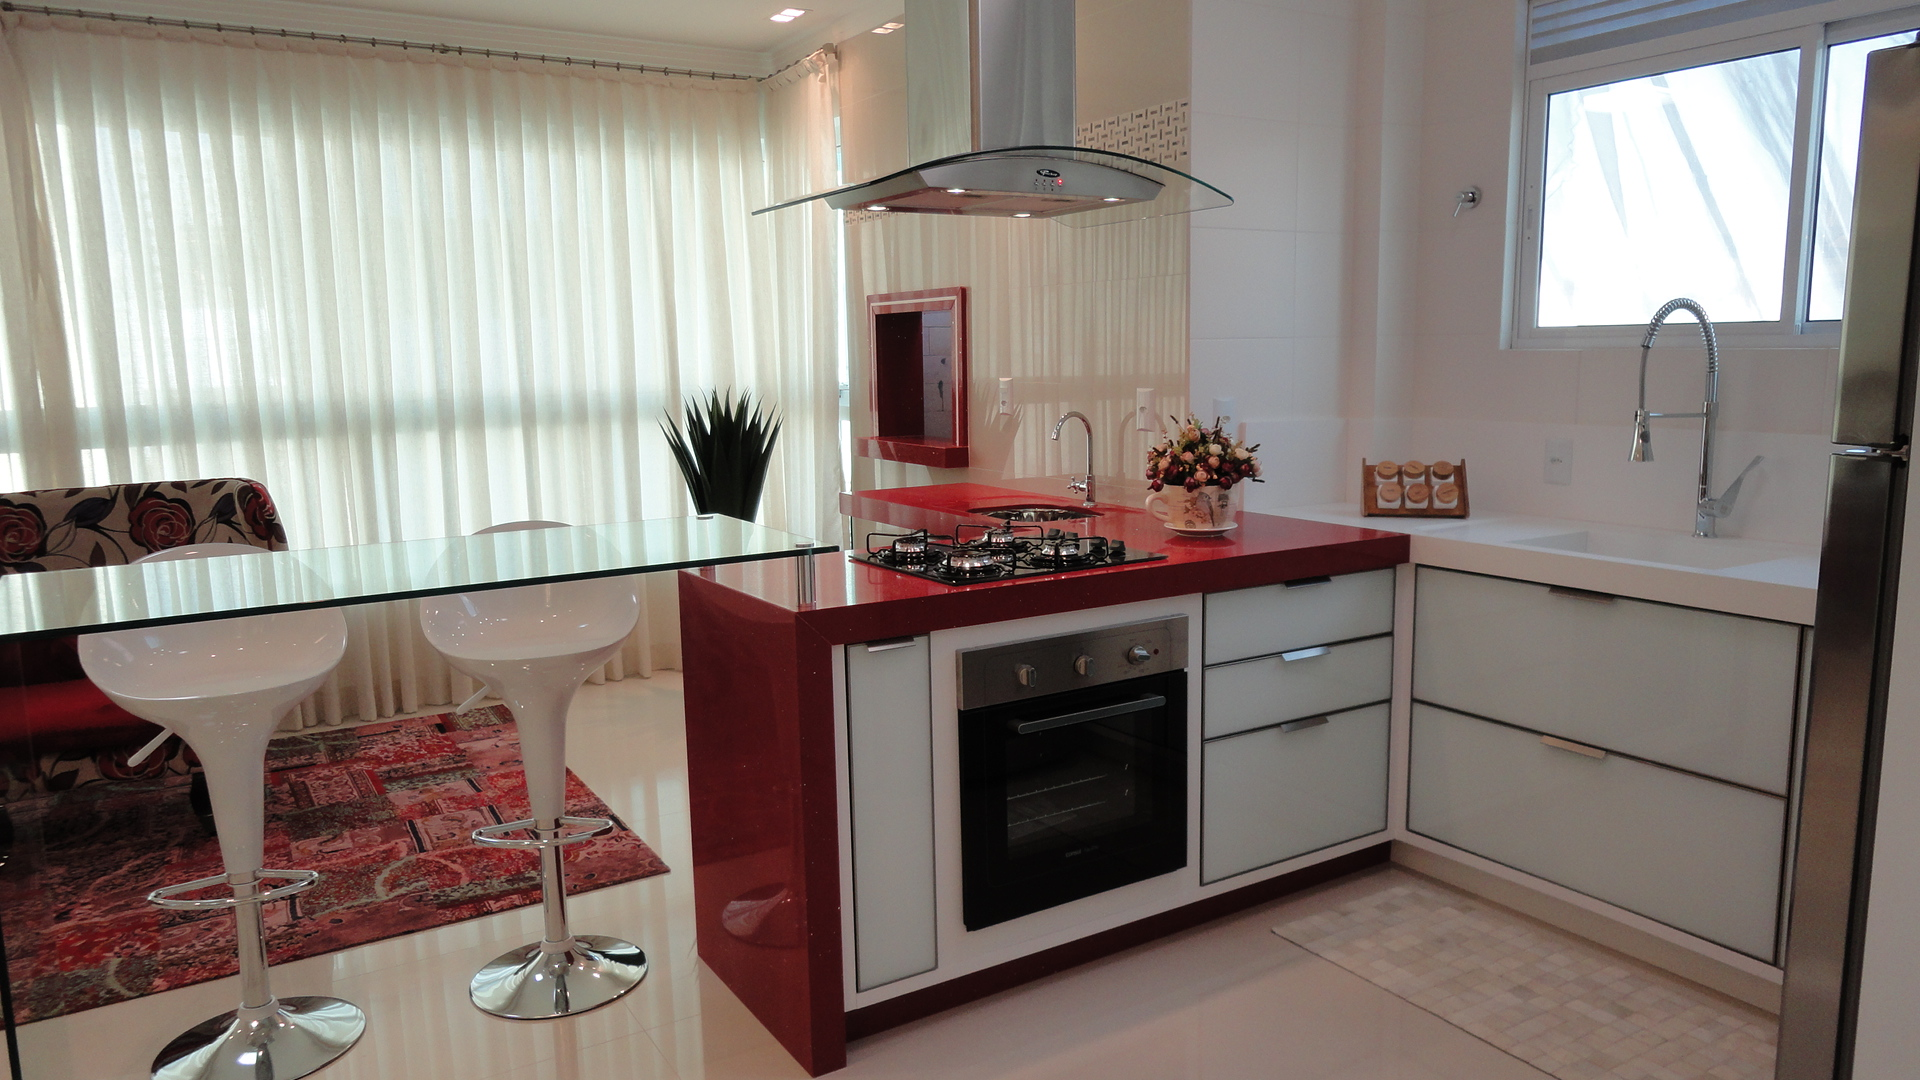 Villa Toscana - Cozinha